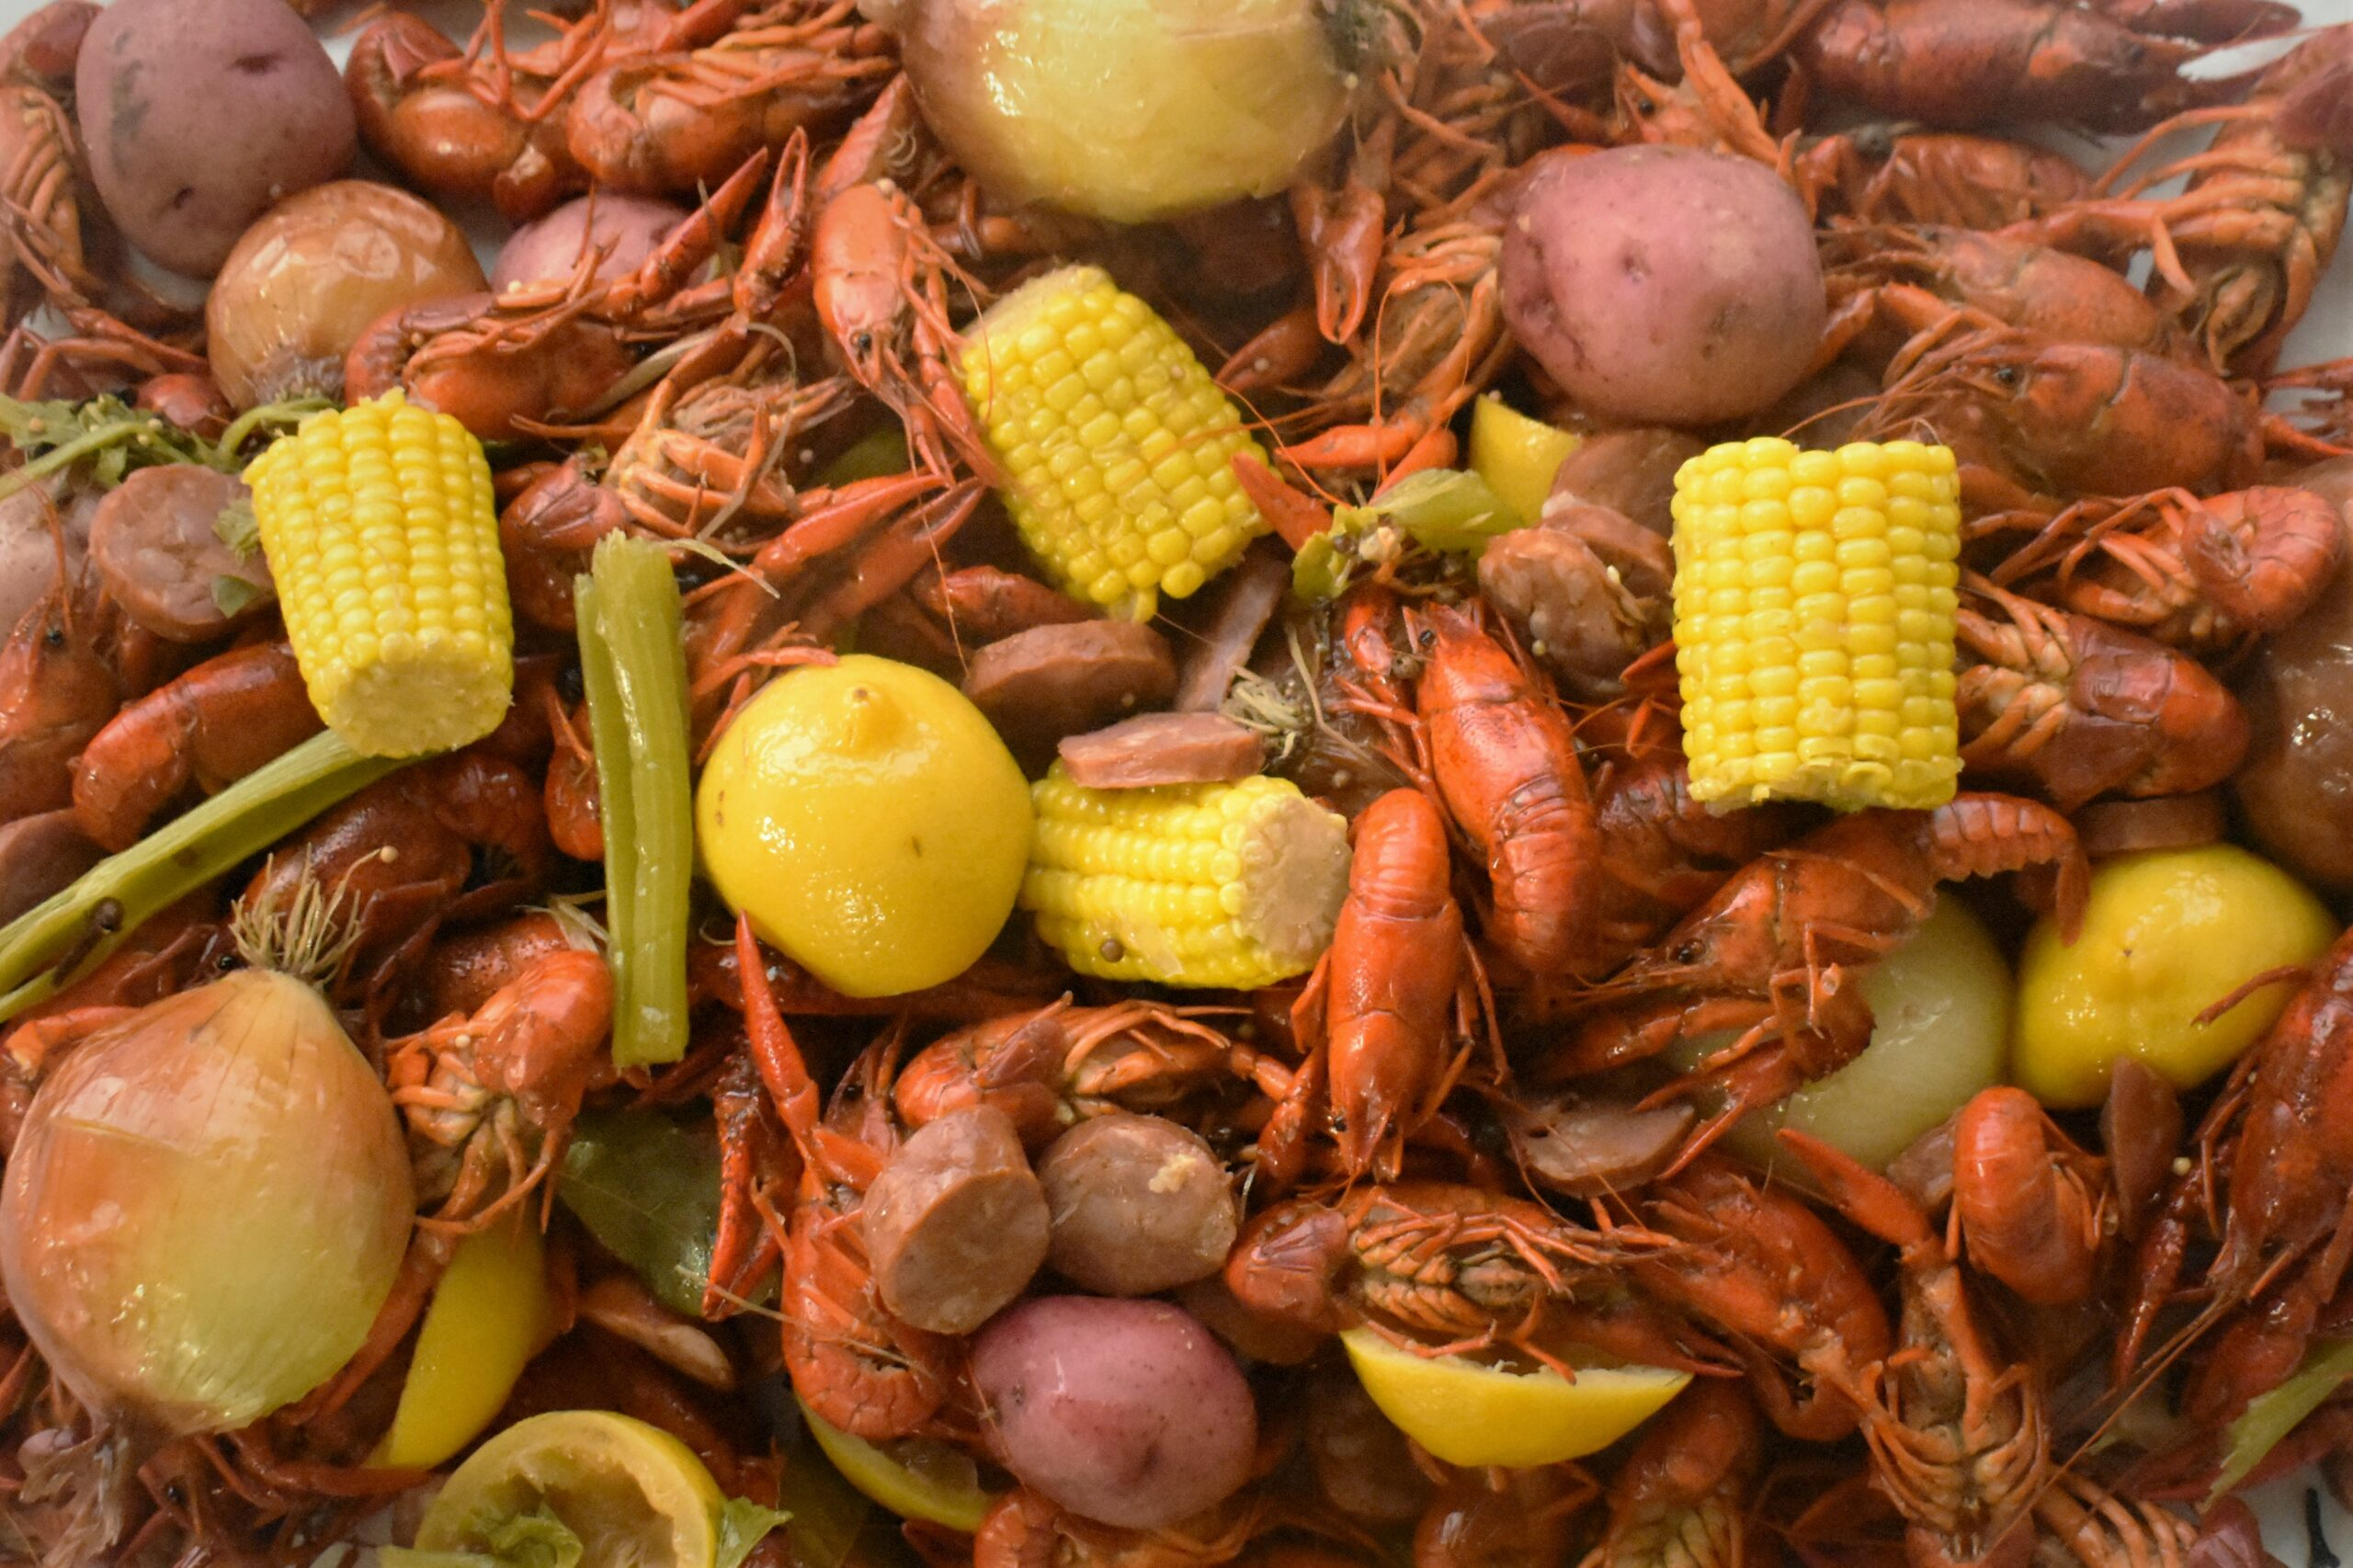 Crawfish or Shrimp Boil